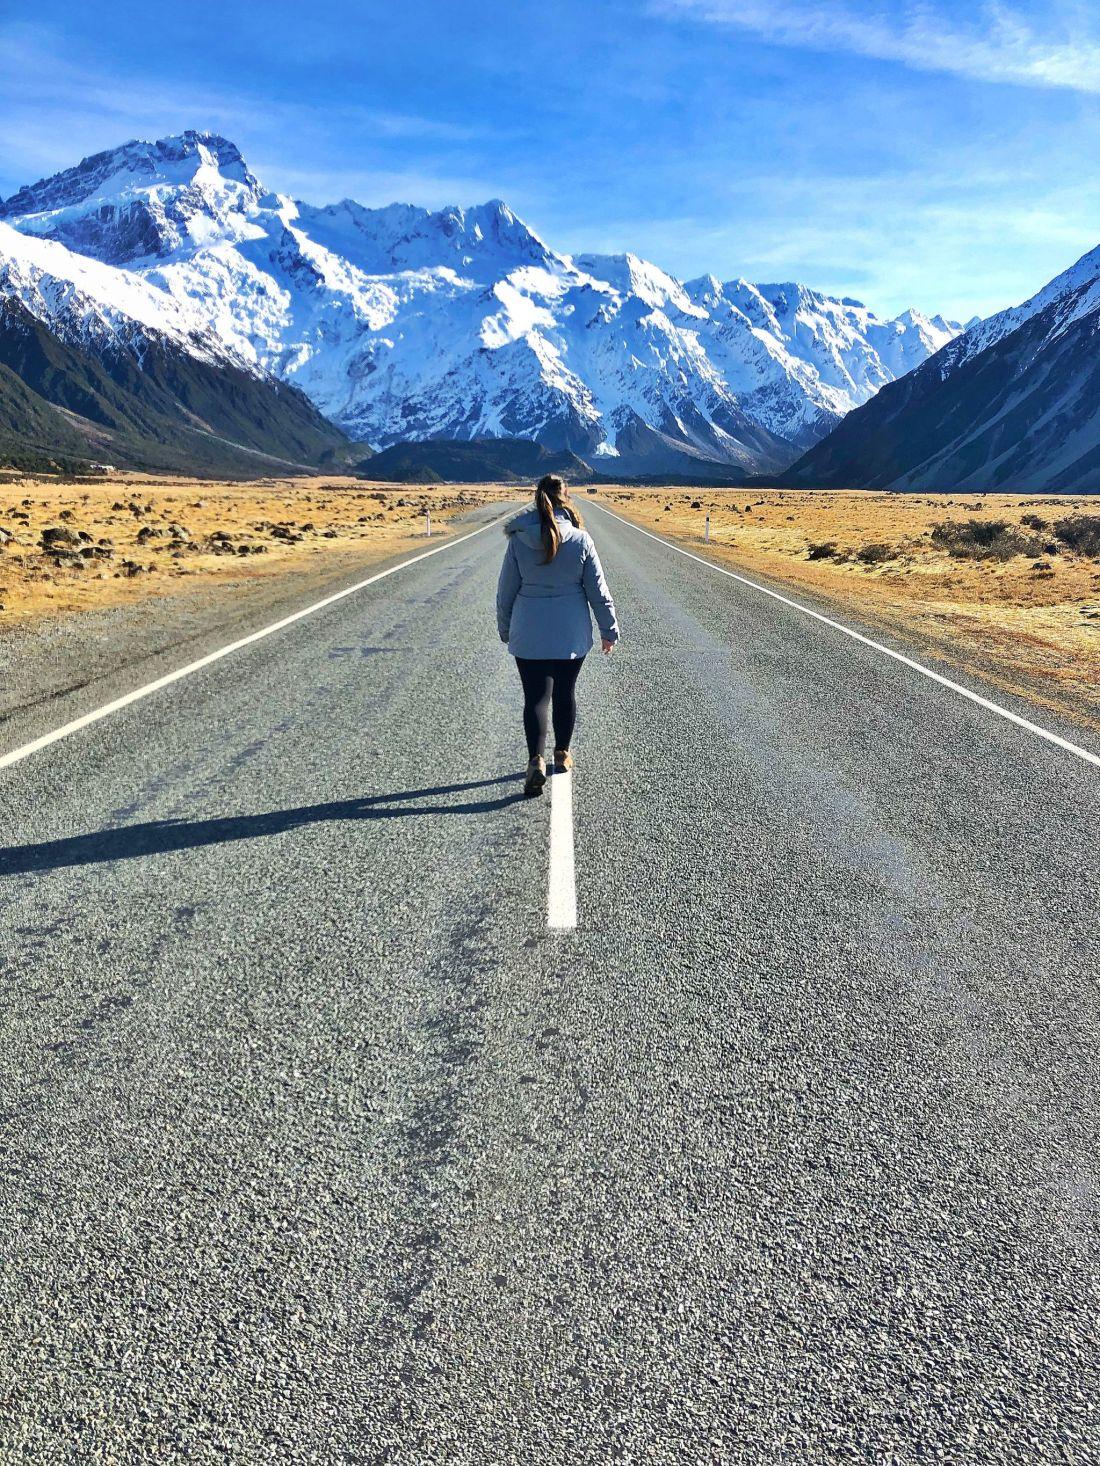 Simone walking road to Mount Cook Village